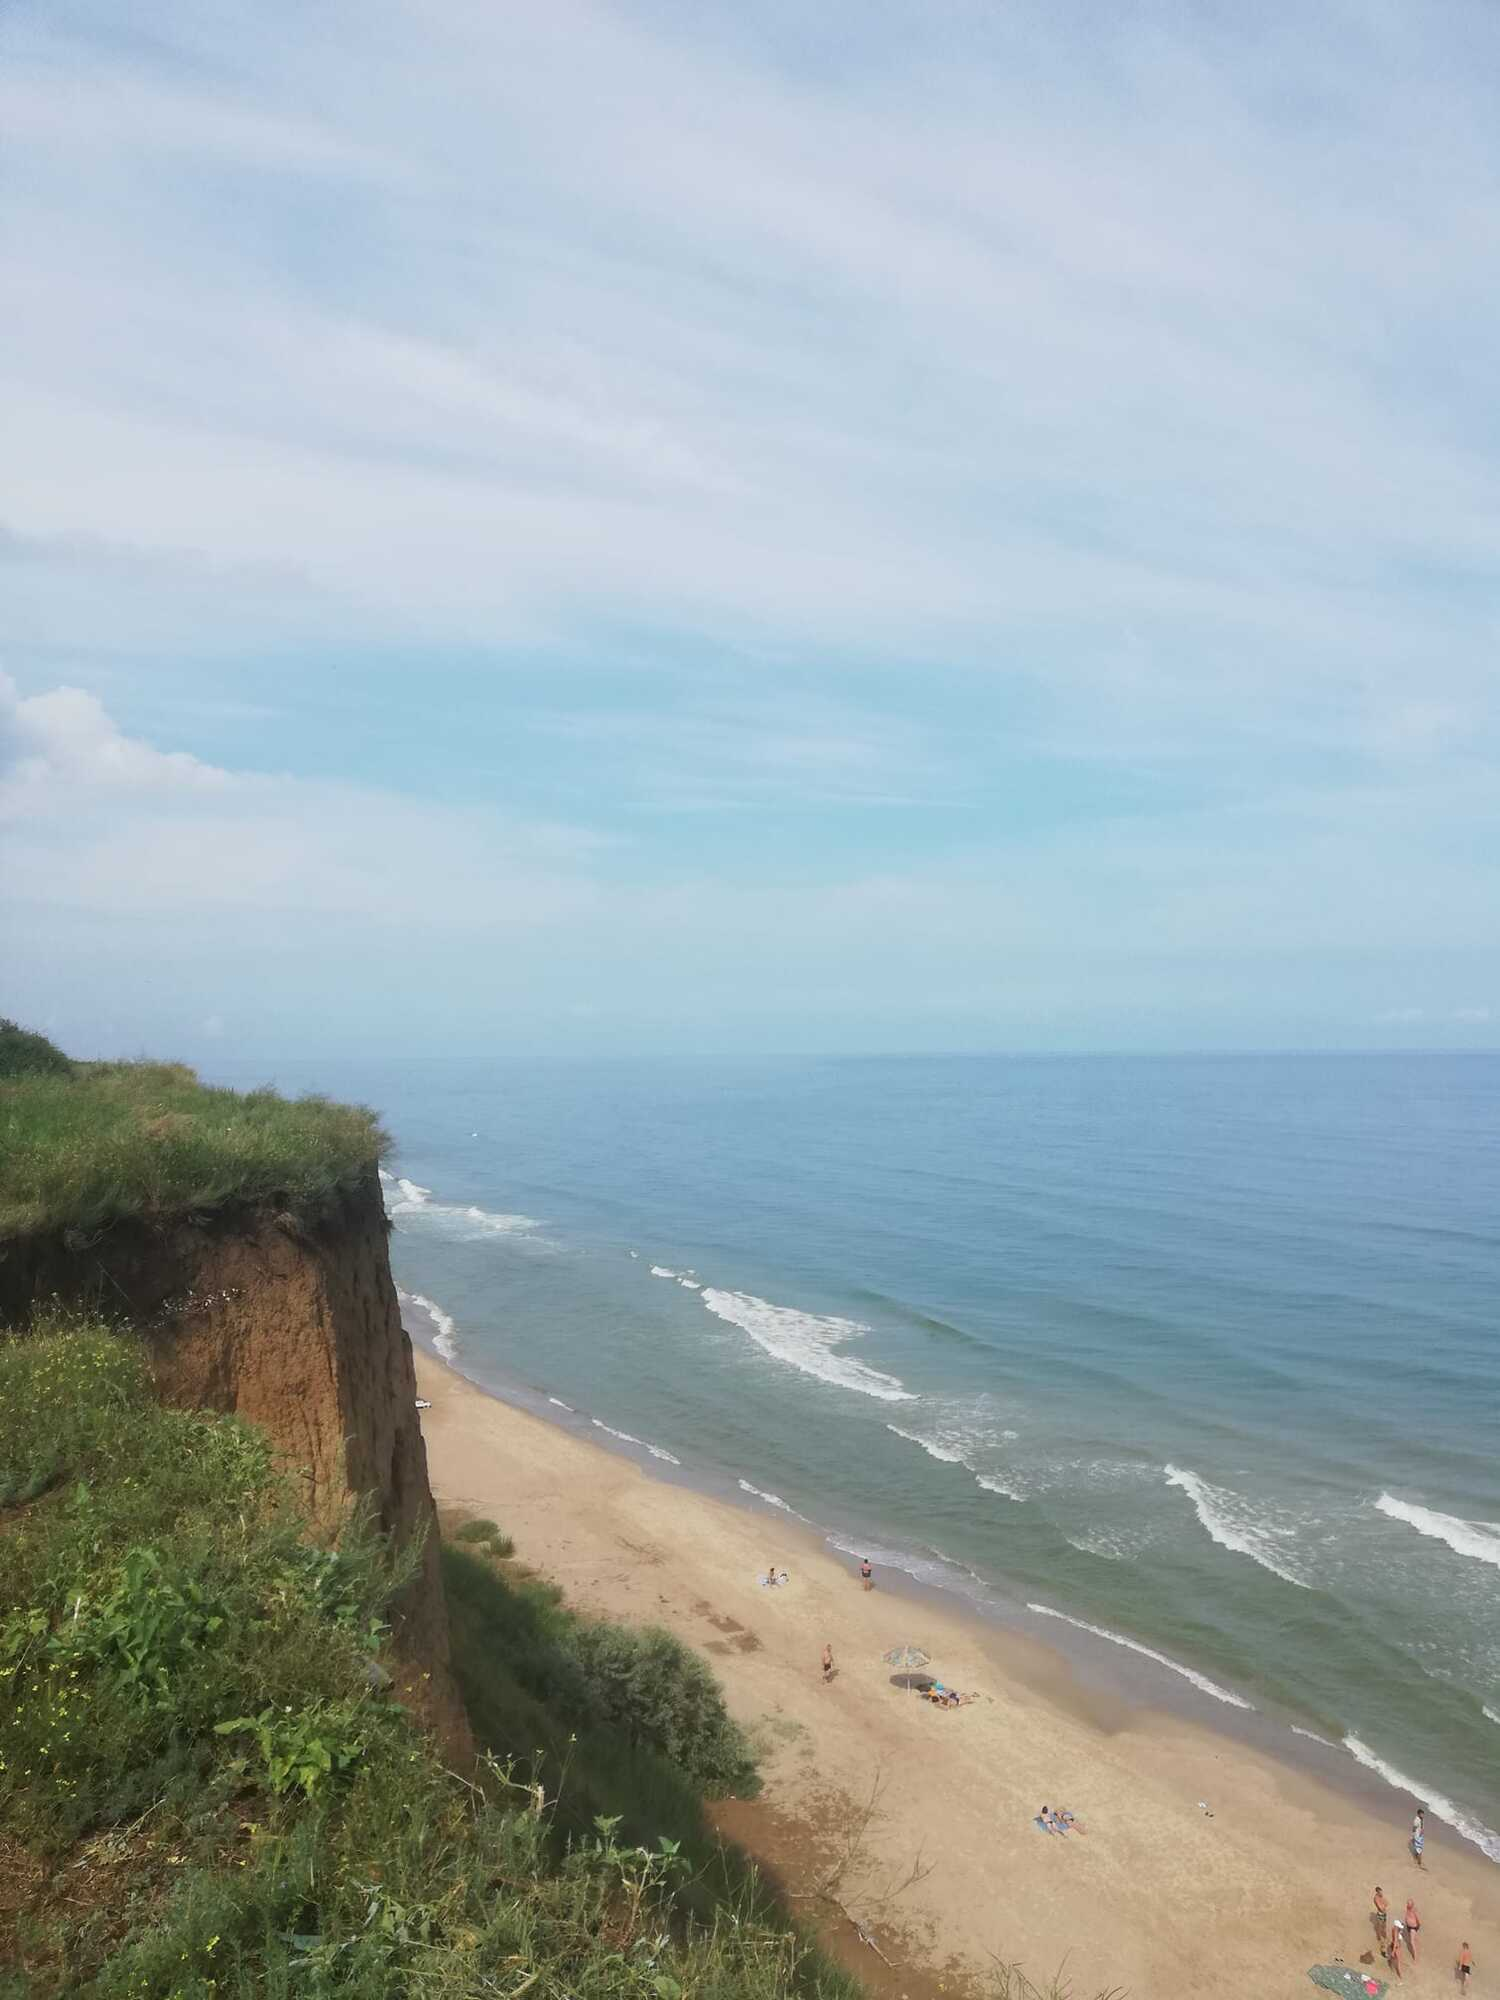 Море очень чистое